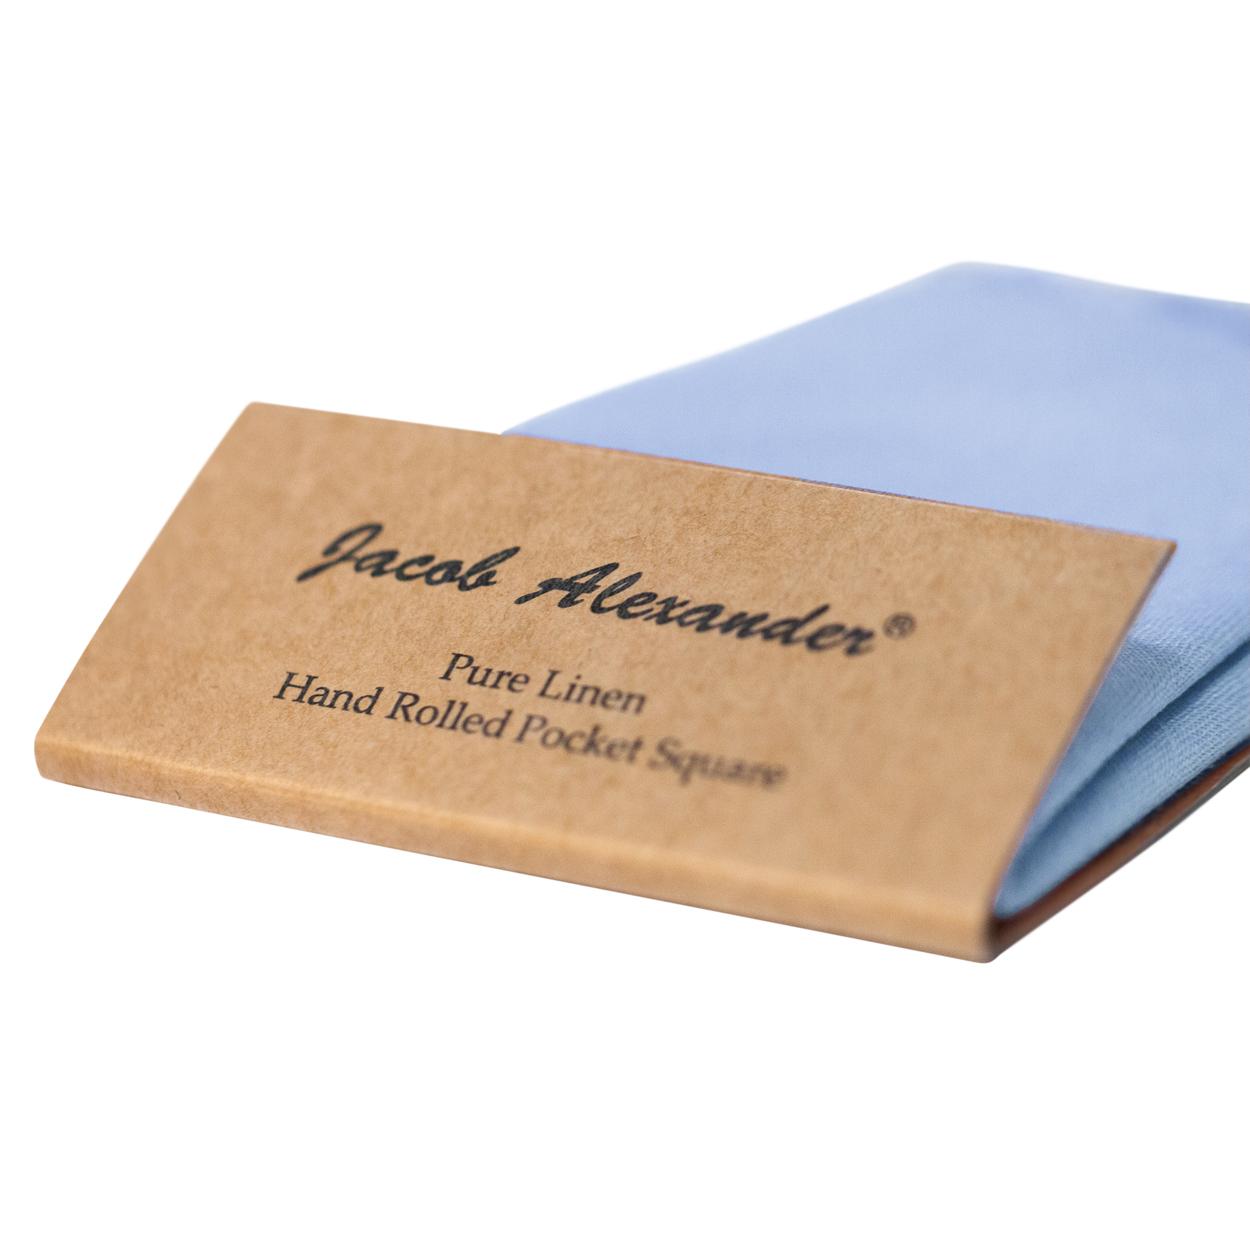 Jacob-Alexander-Linen-Handrolled-15-034-x-15-034-Pocket-Square-Hanky thumbnail 32